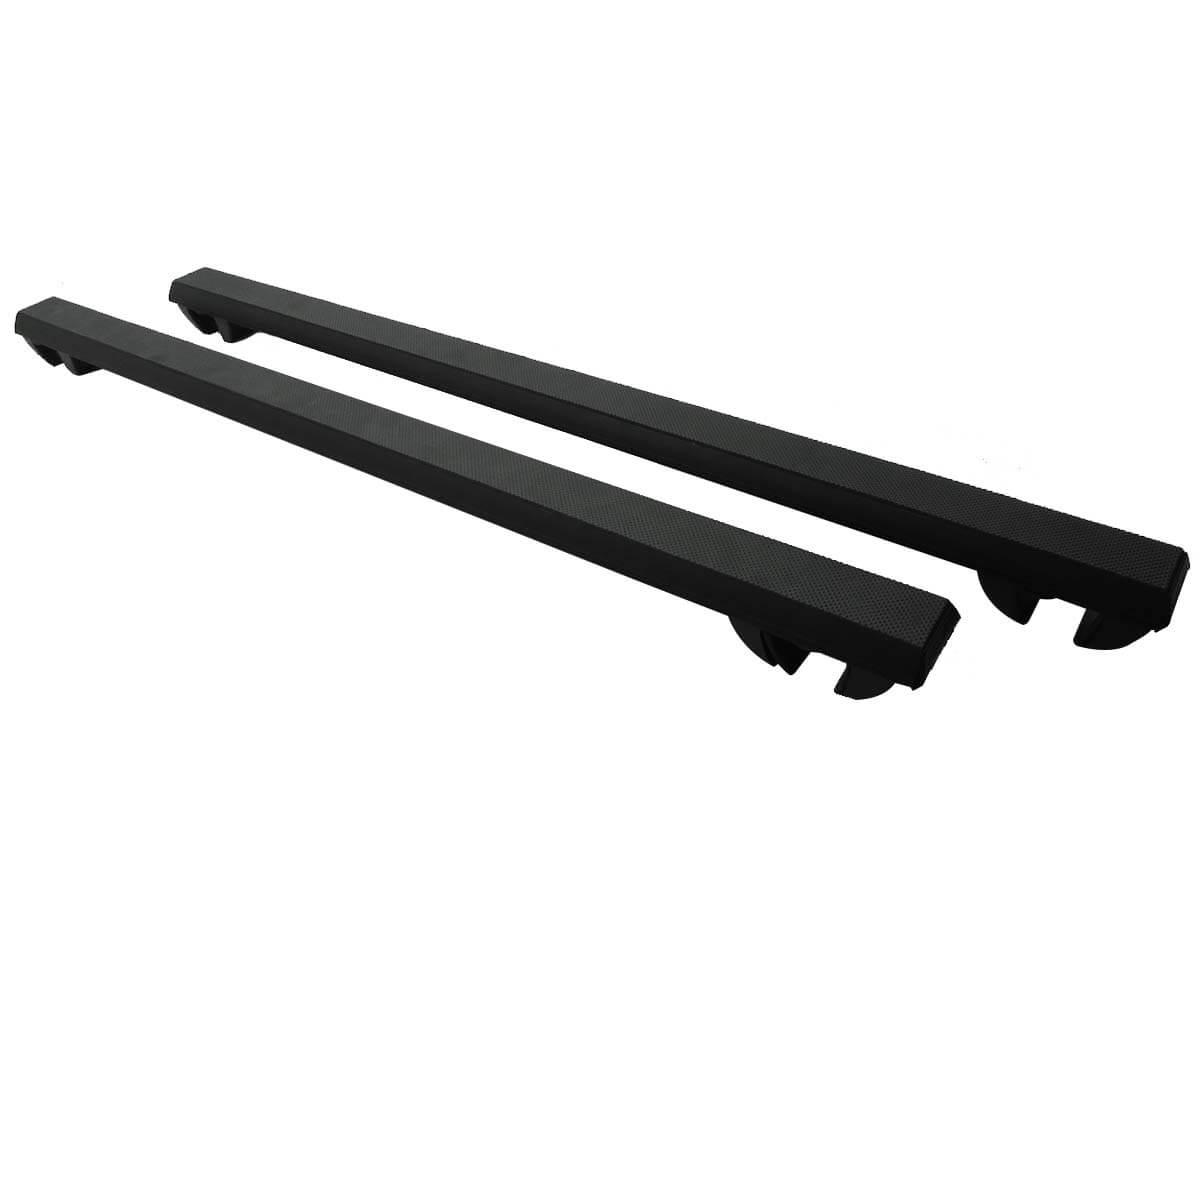 Travessa rack de teto Long Life Grip 1,10 m Alumínio Preto